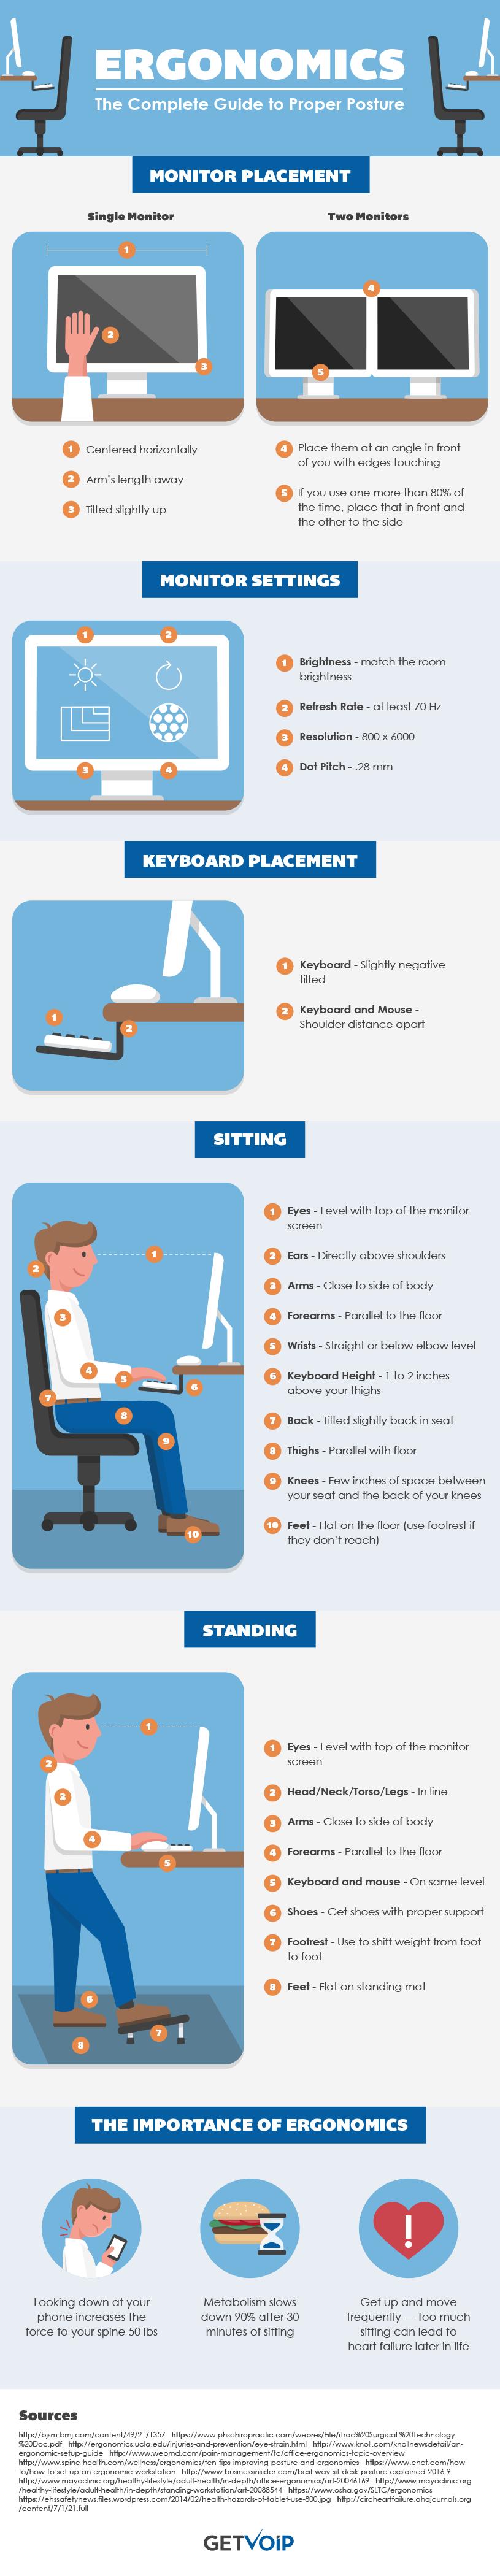 Office Ergonomics The Complete Guide To Proper Posture